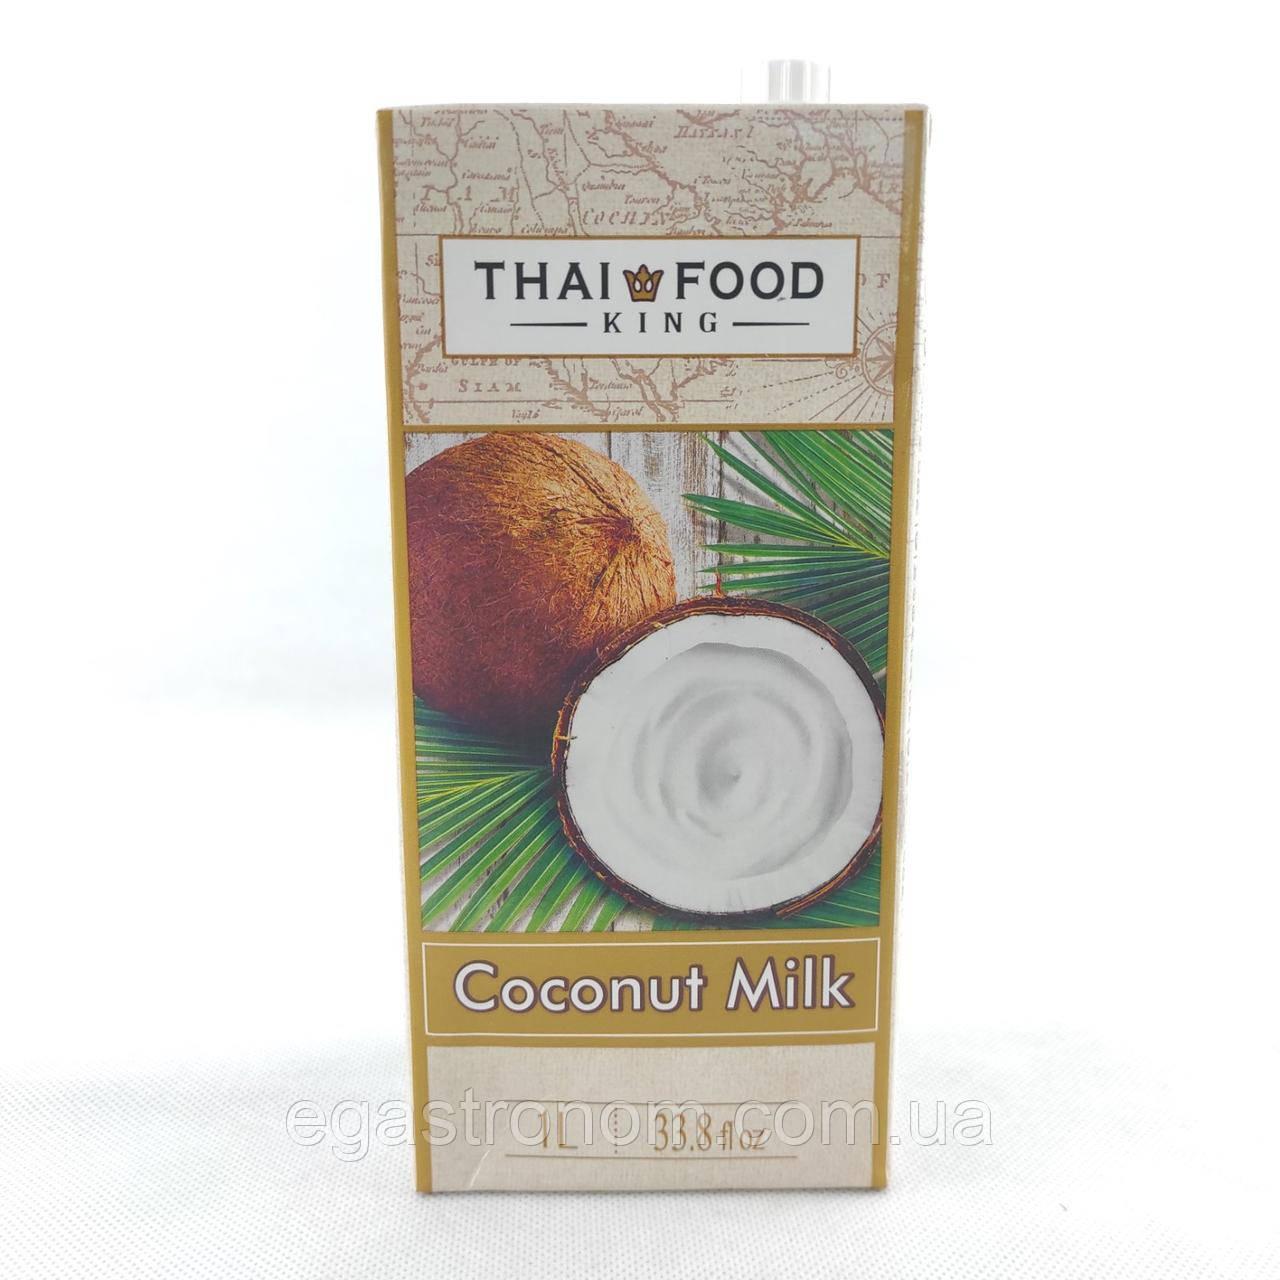 Кокосове молоко Тай Фуд Thai Food 1L 12шт/ящ (Код : 00-00003047)